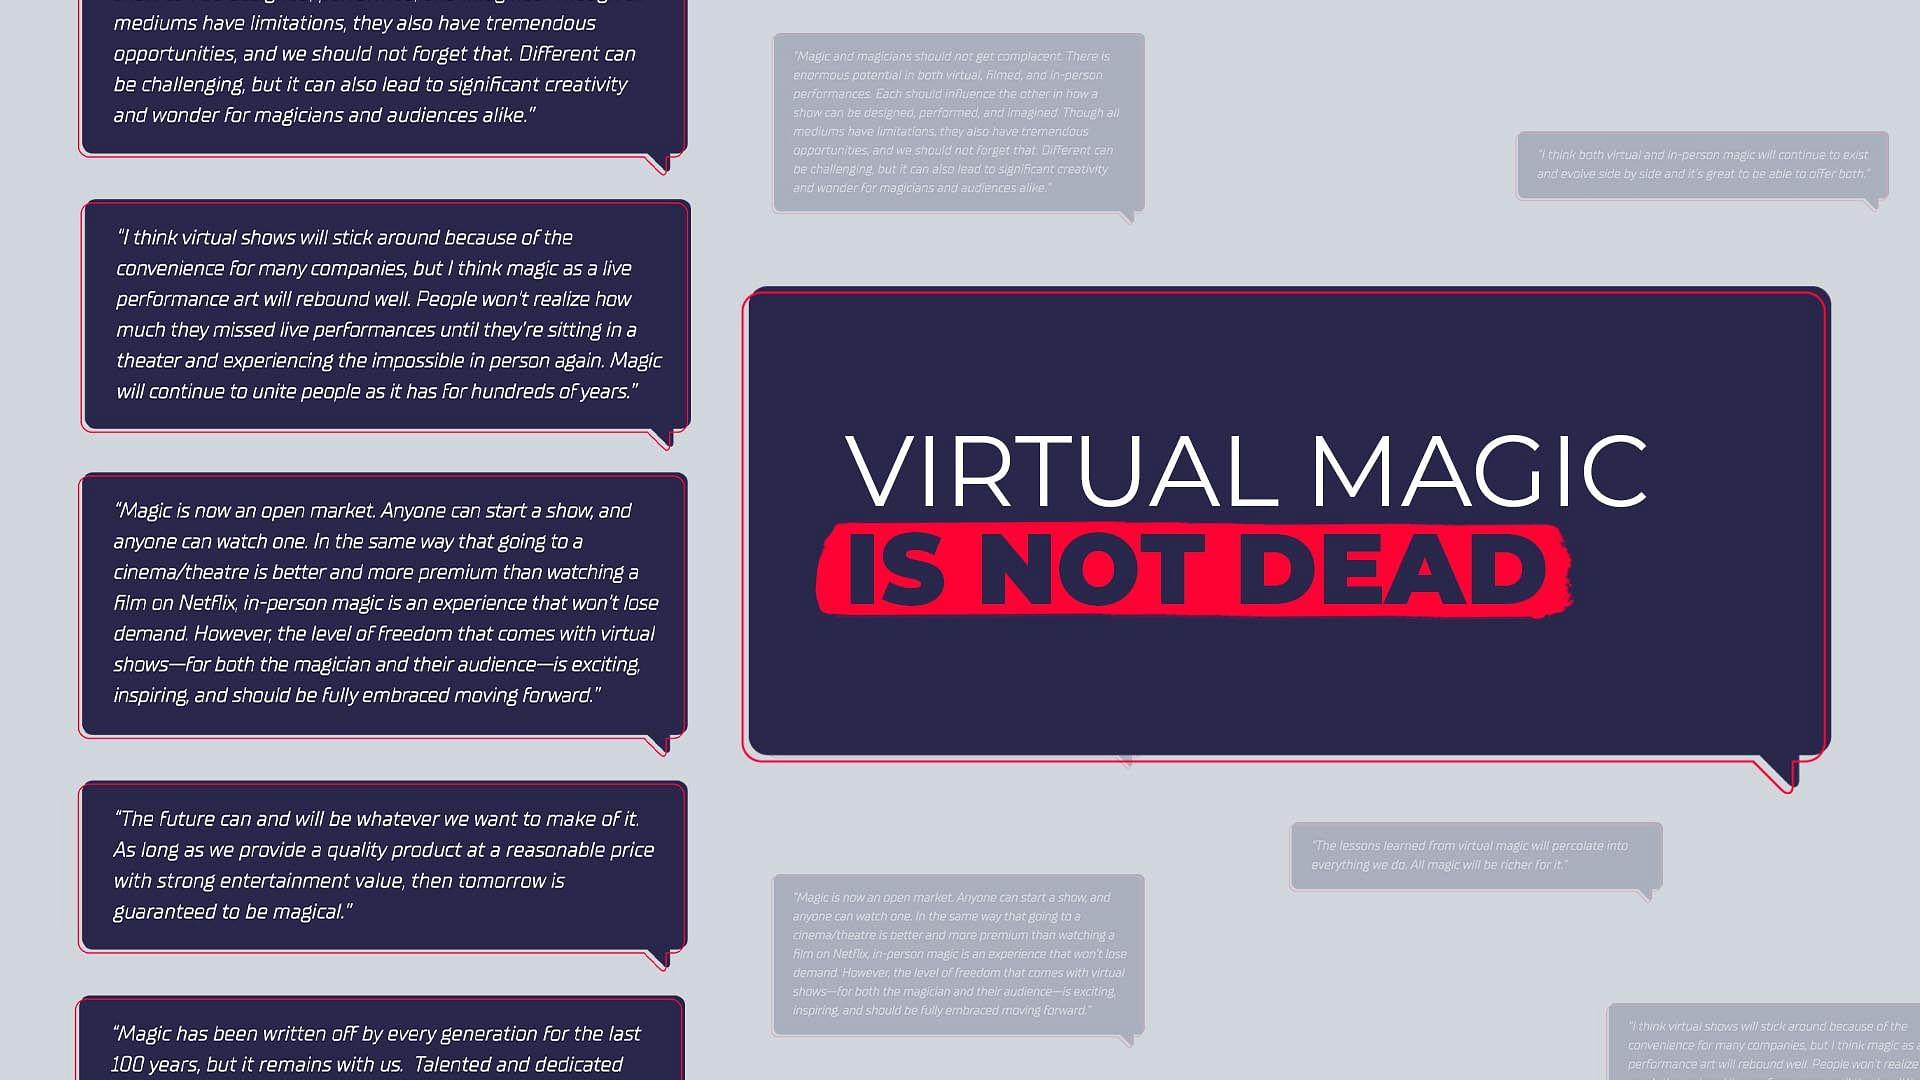 Zoom magic is not dead